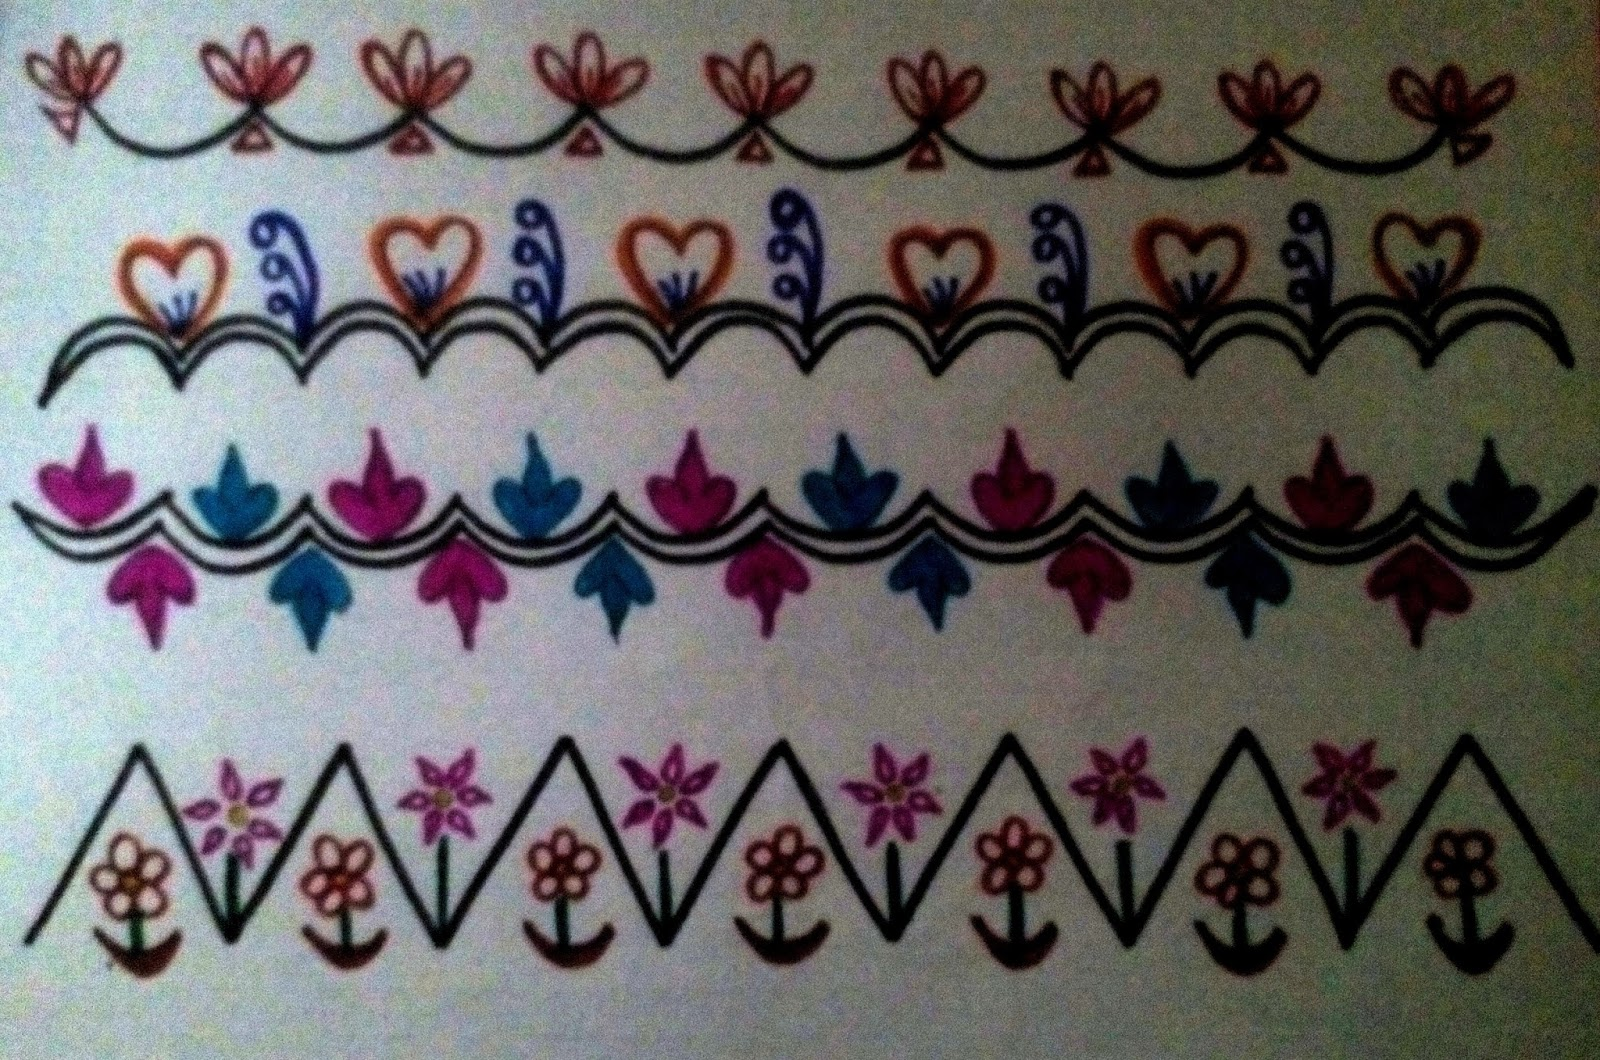 Vanathi S Rangoli Art Crafts Rangoli Border Designs